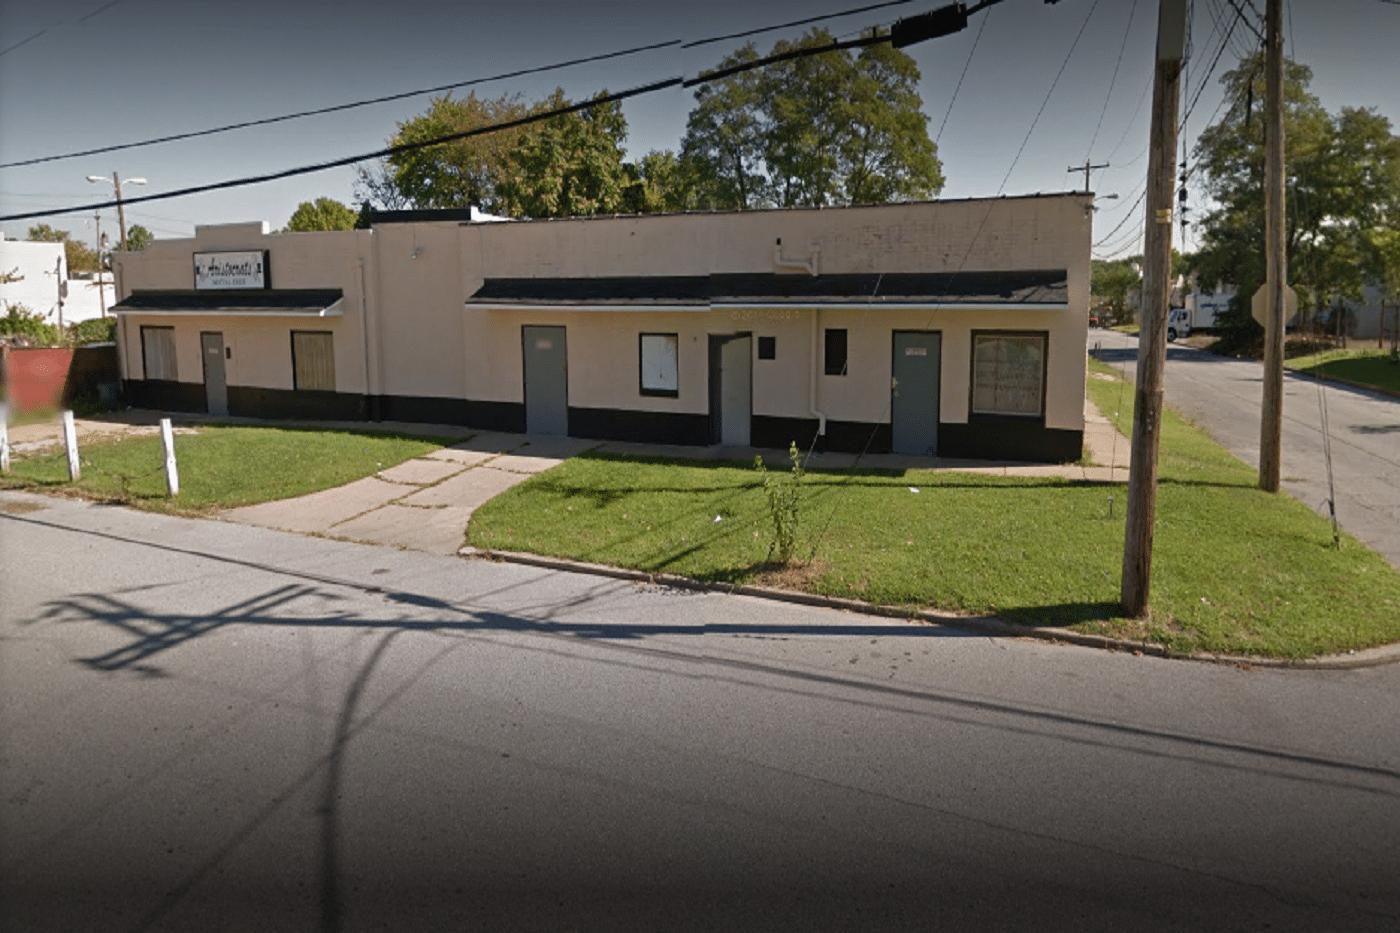 Aristocrat Social Club 1305 Todds Ln, Wilmington, DE Cited for Refilling Liquor Bottles